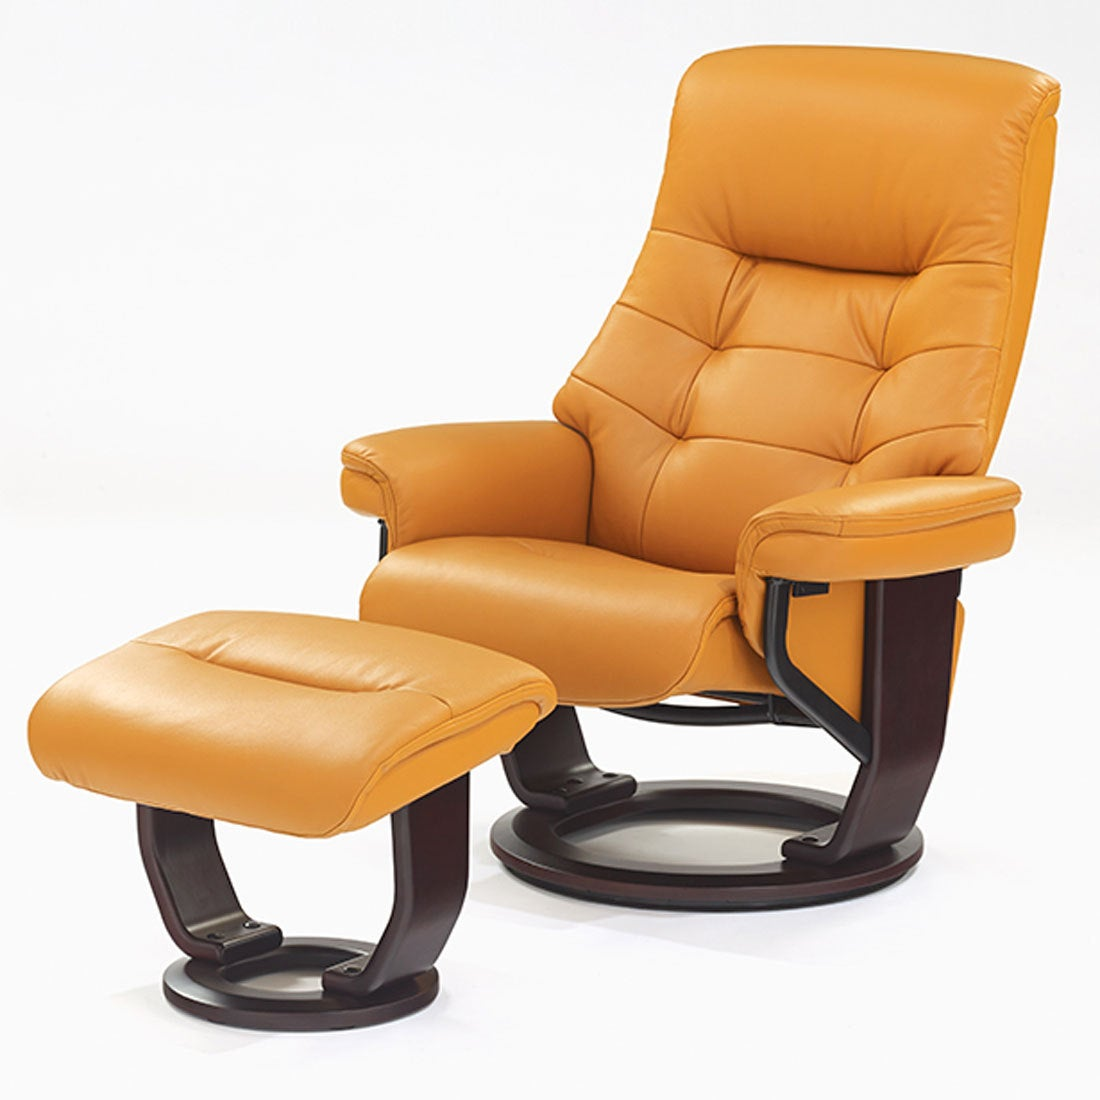 IDC OTSUKA/大塚家具 リクライニングチェア マルコーニ2 半革オレンジ オットマン付 (オレンジ)